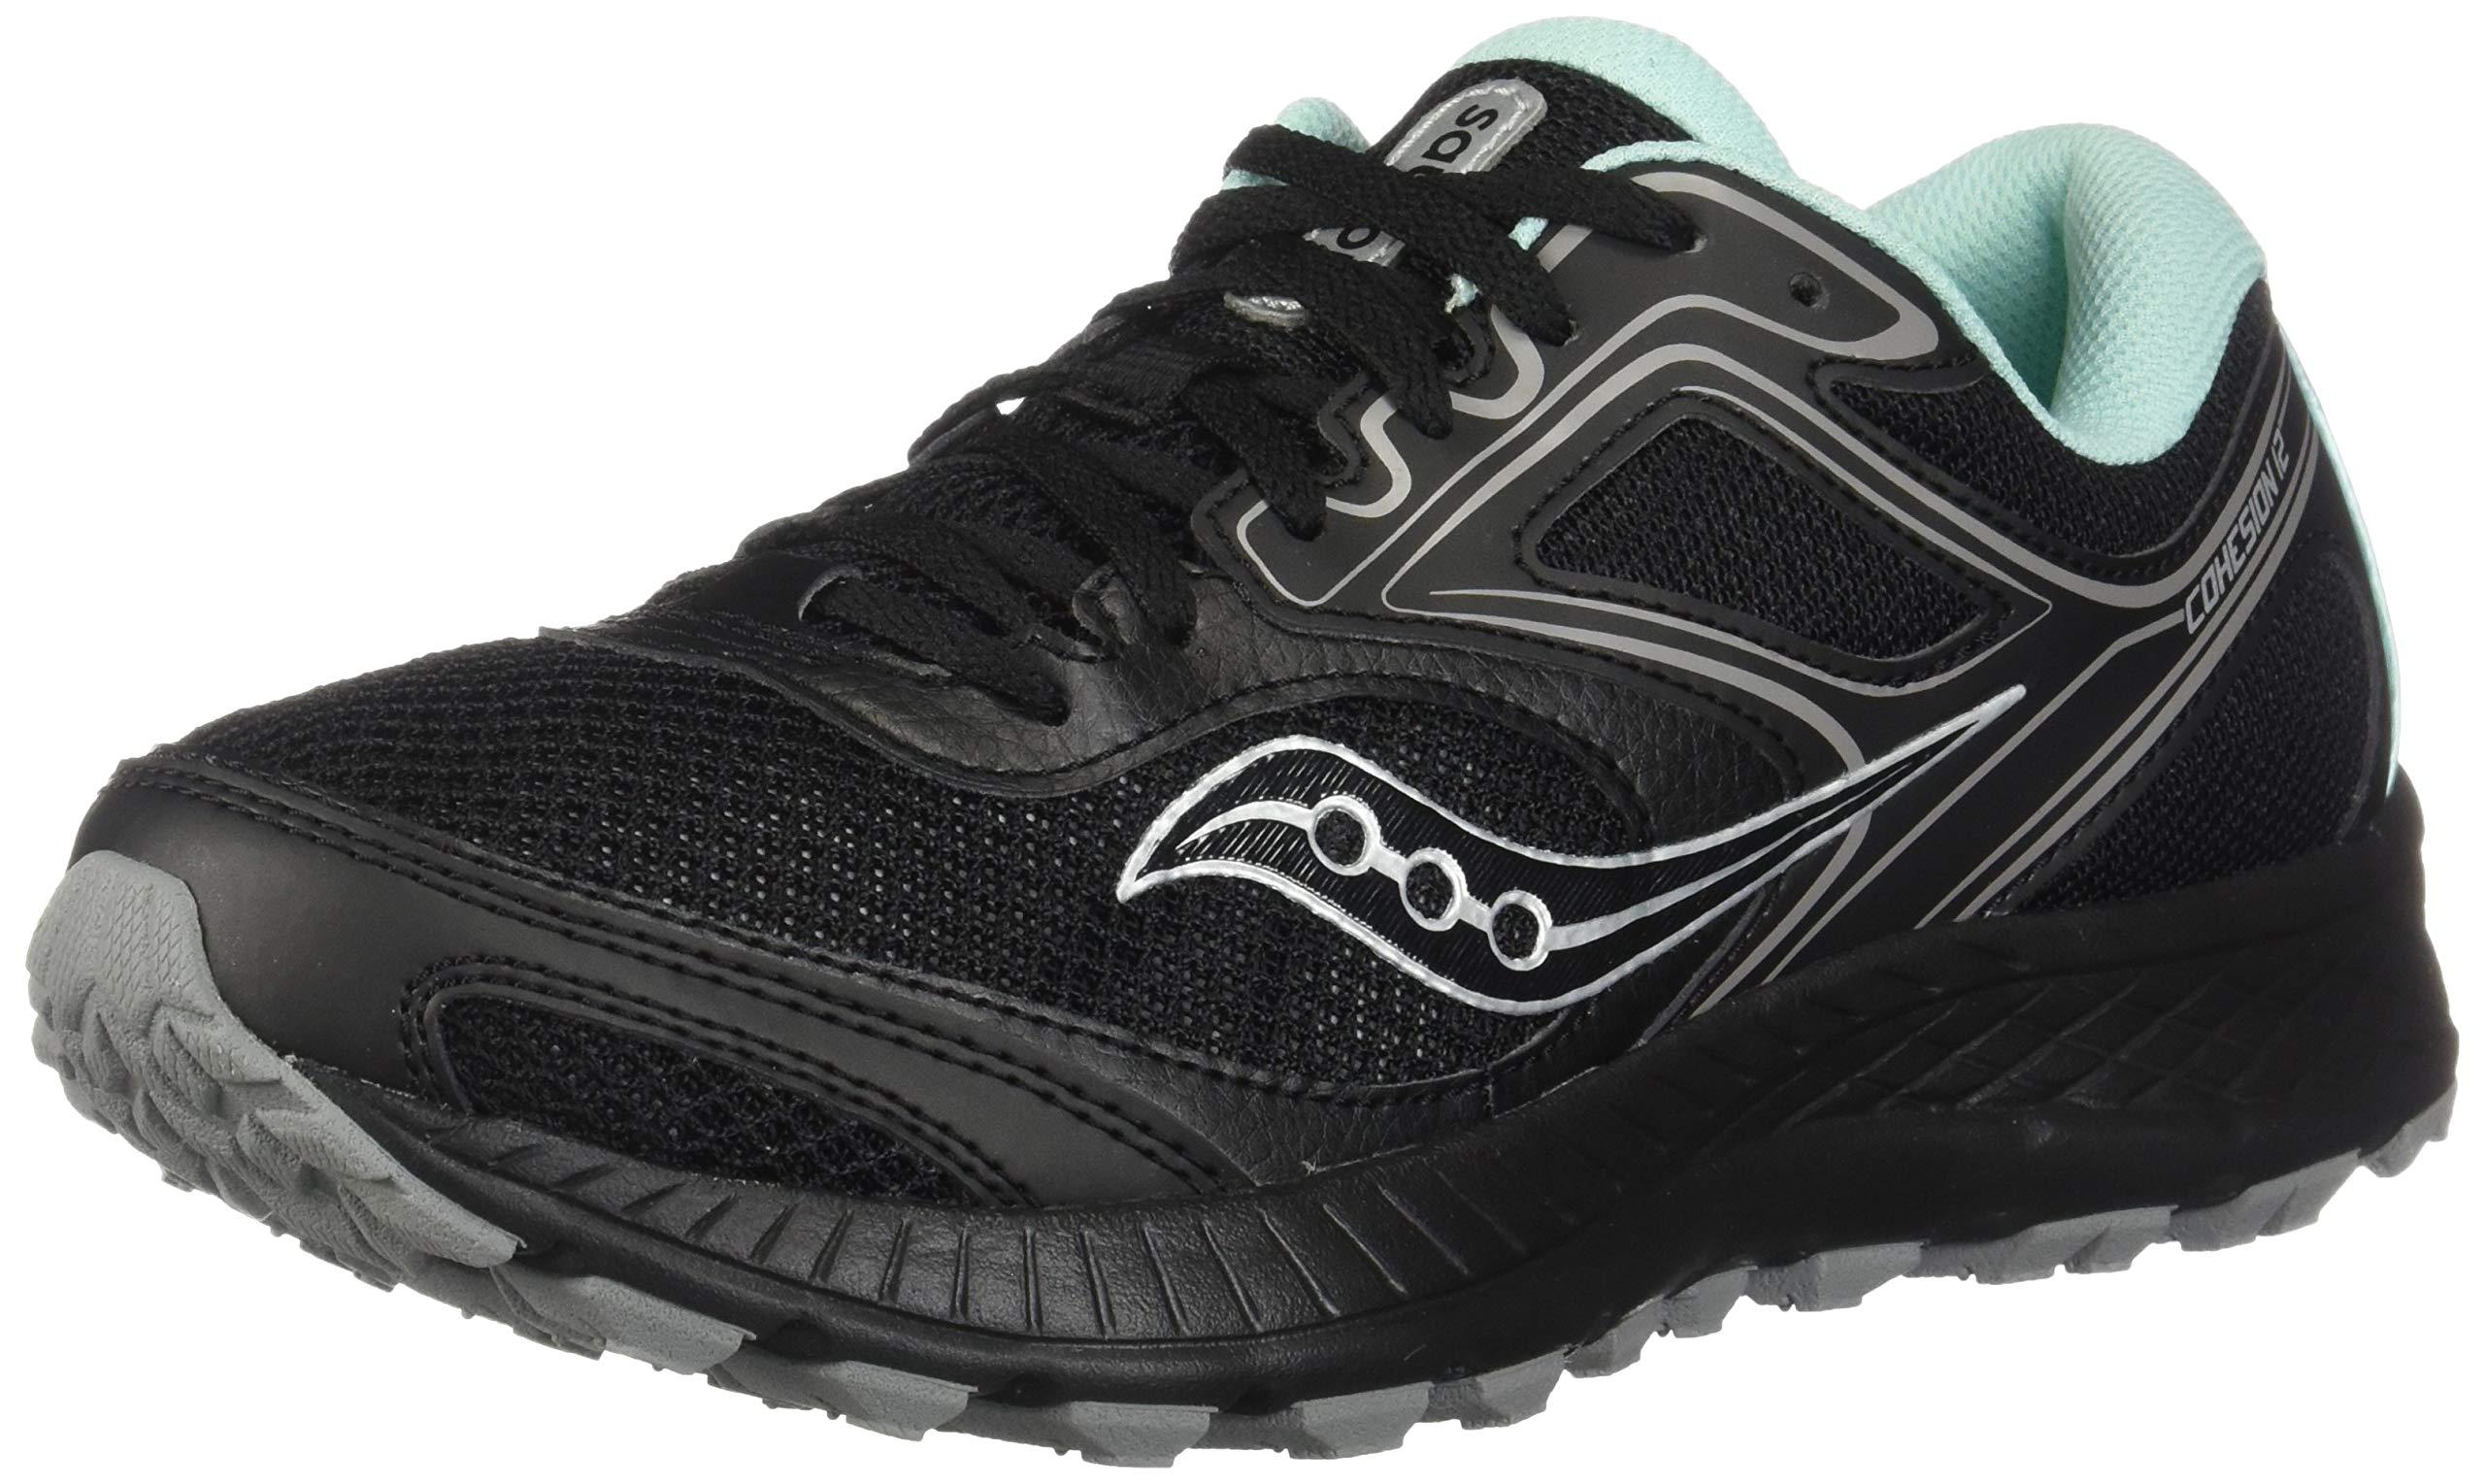 Saucony VERSAFOAM Cohesion TR12 Trail Running Shoe, Black/Teal, 5 Medium Women